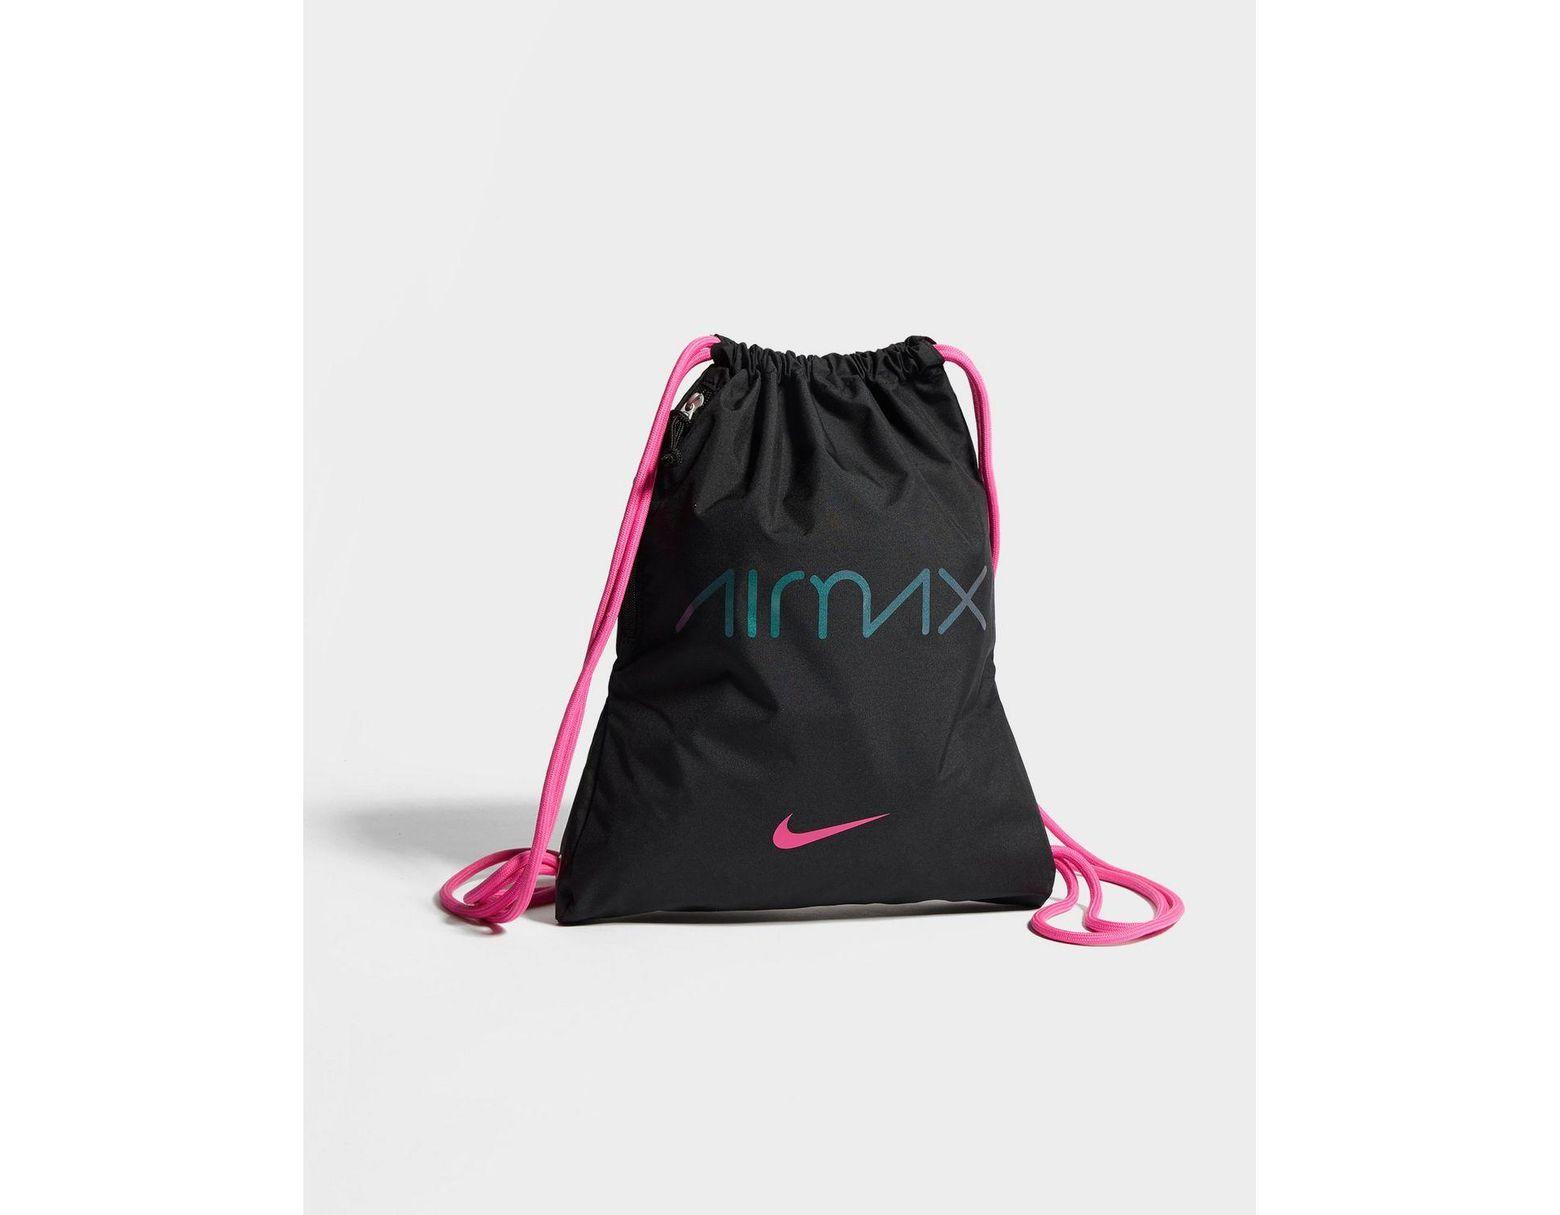 timeless design 51578 cc309 Nike Air Max Day Gymsack in Black for Men - Lyst